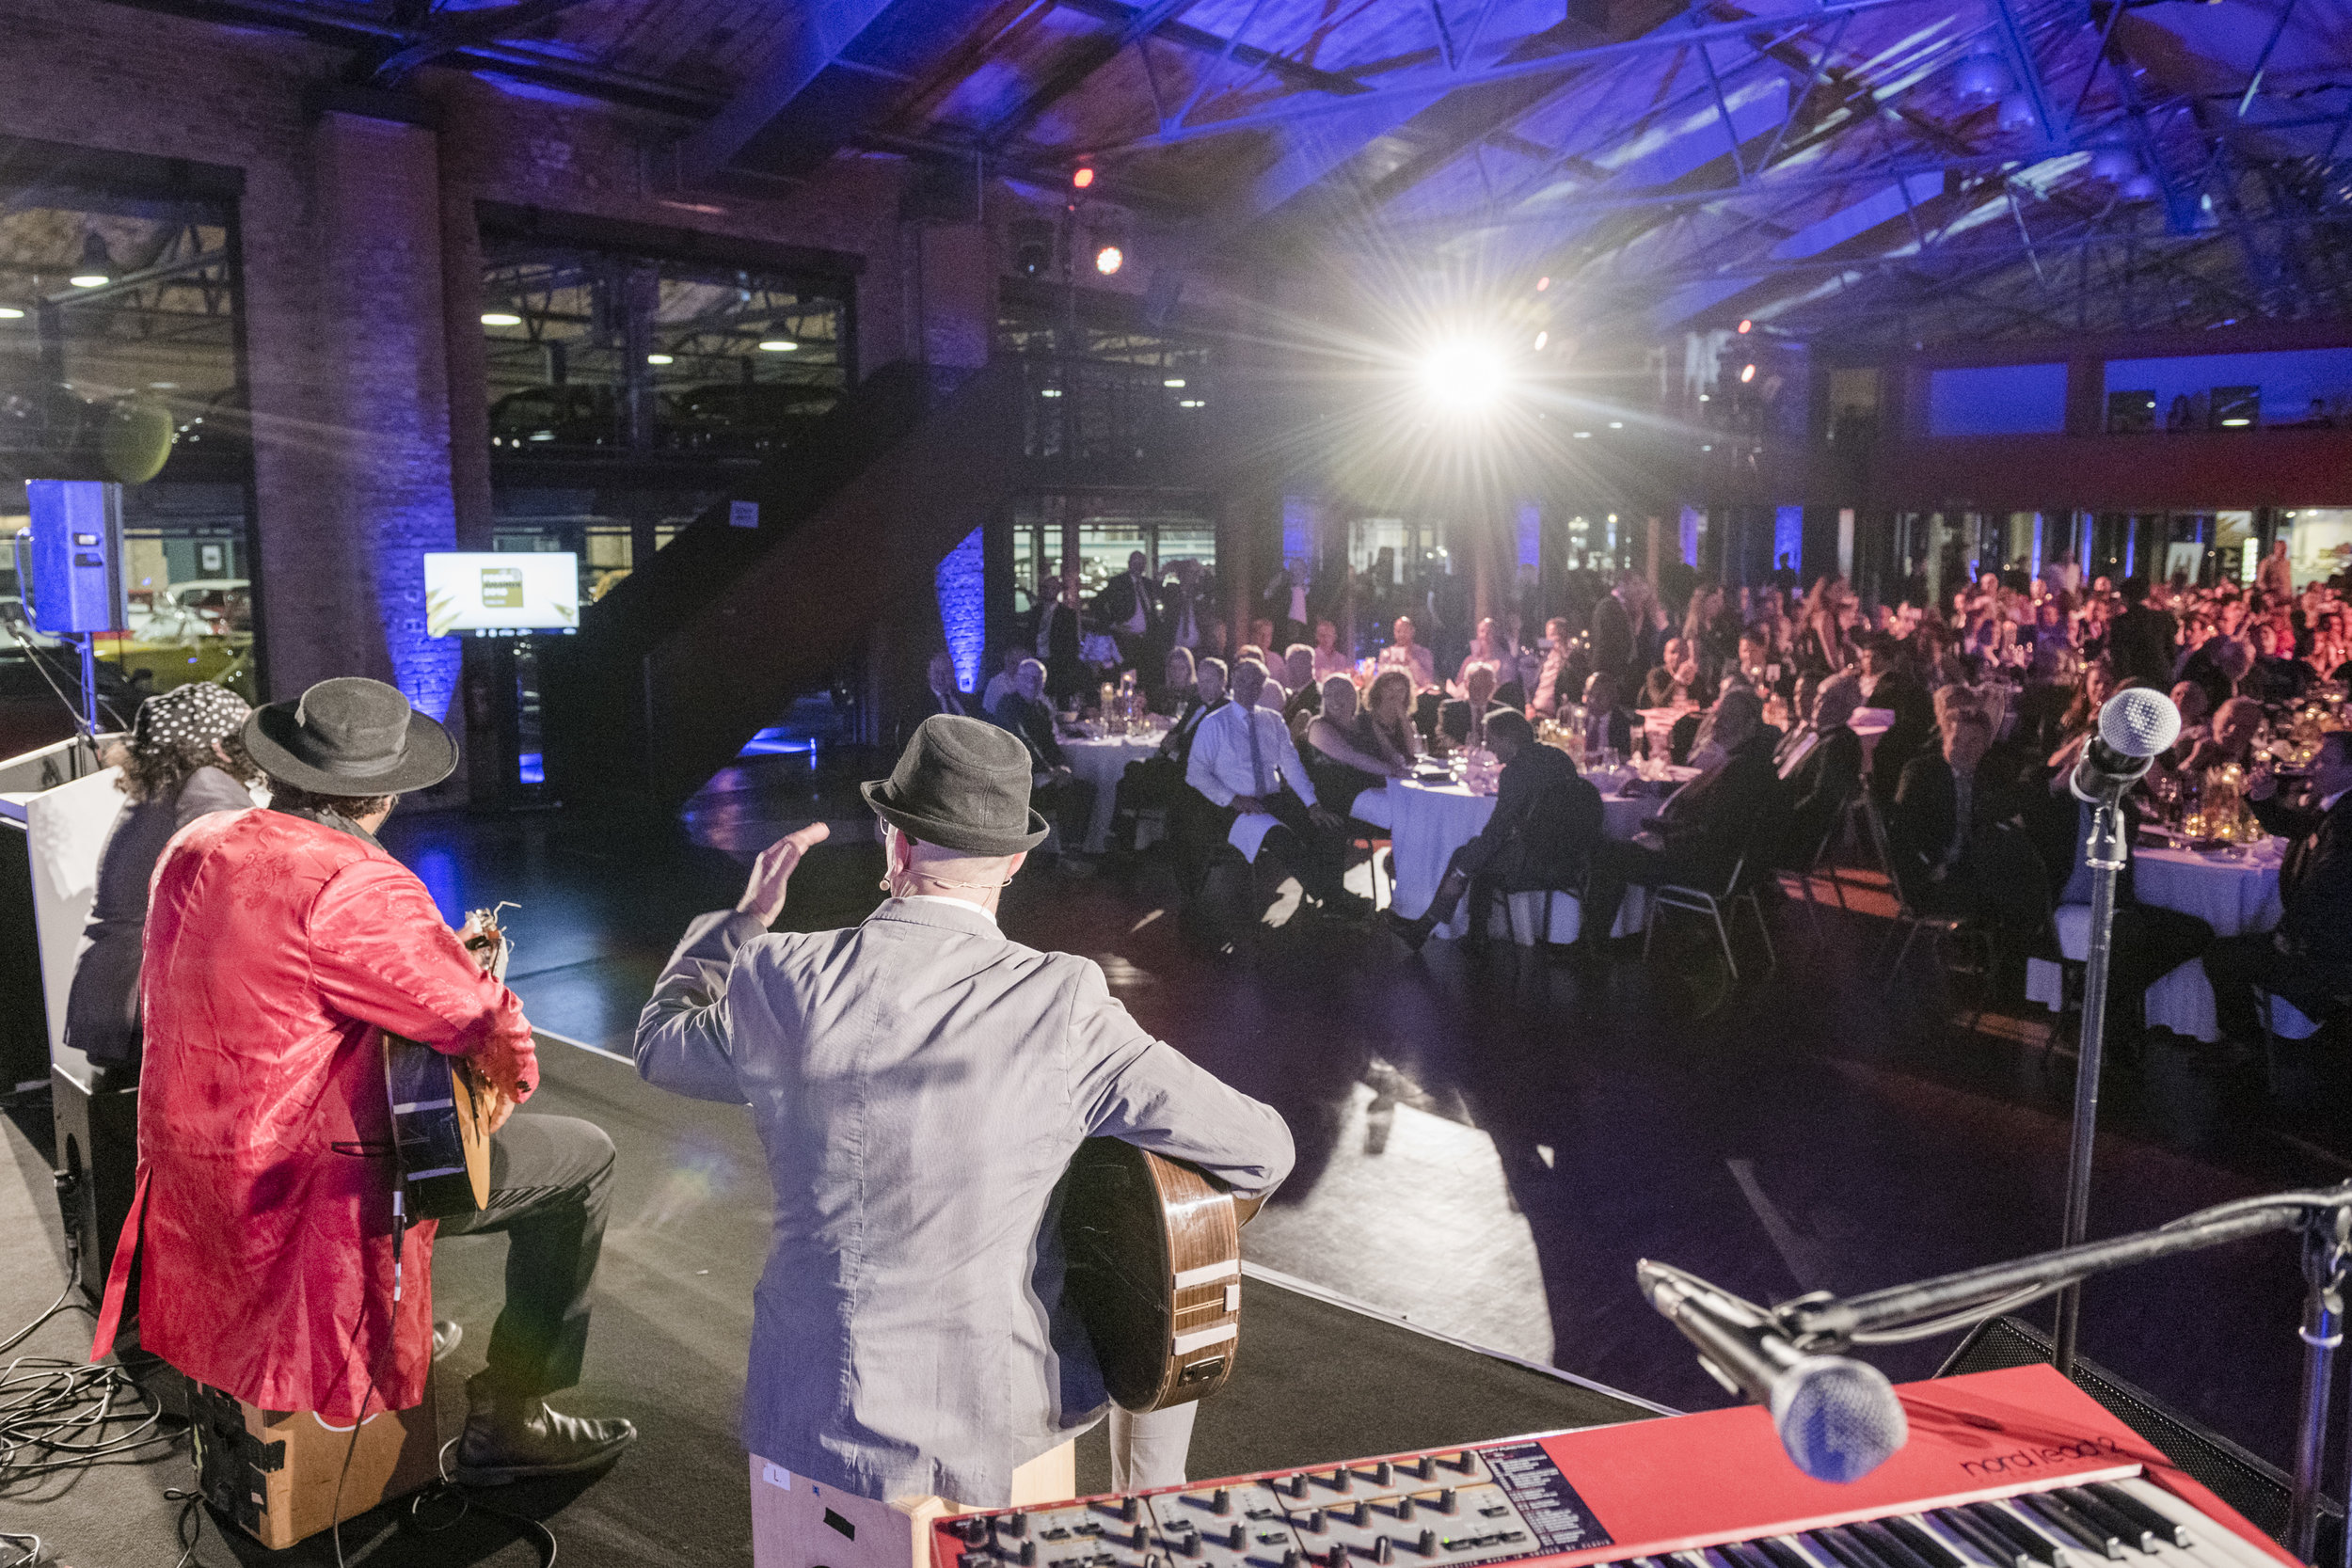 2018-05-16_FESPA_Awards_0150.jpg